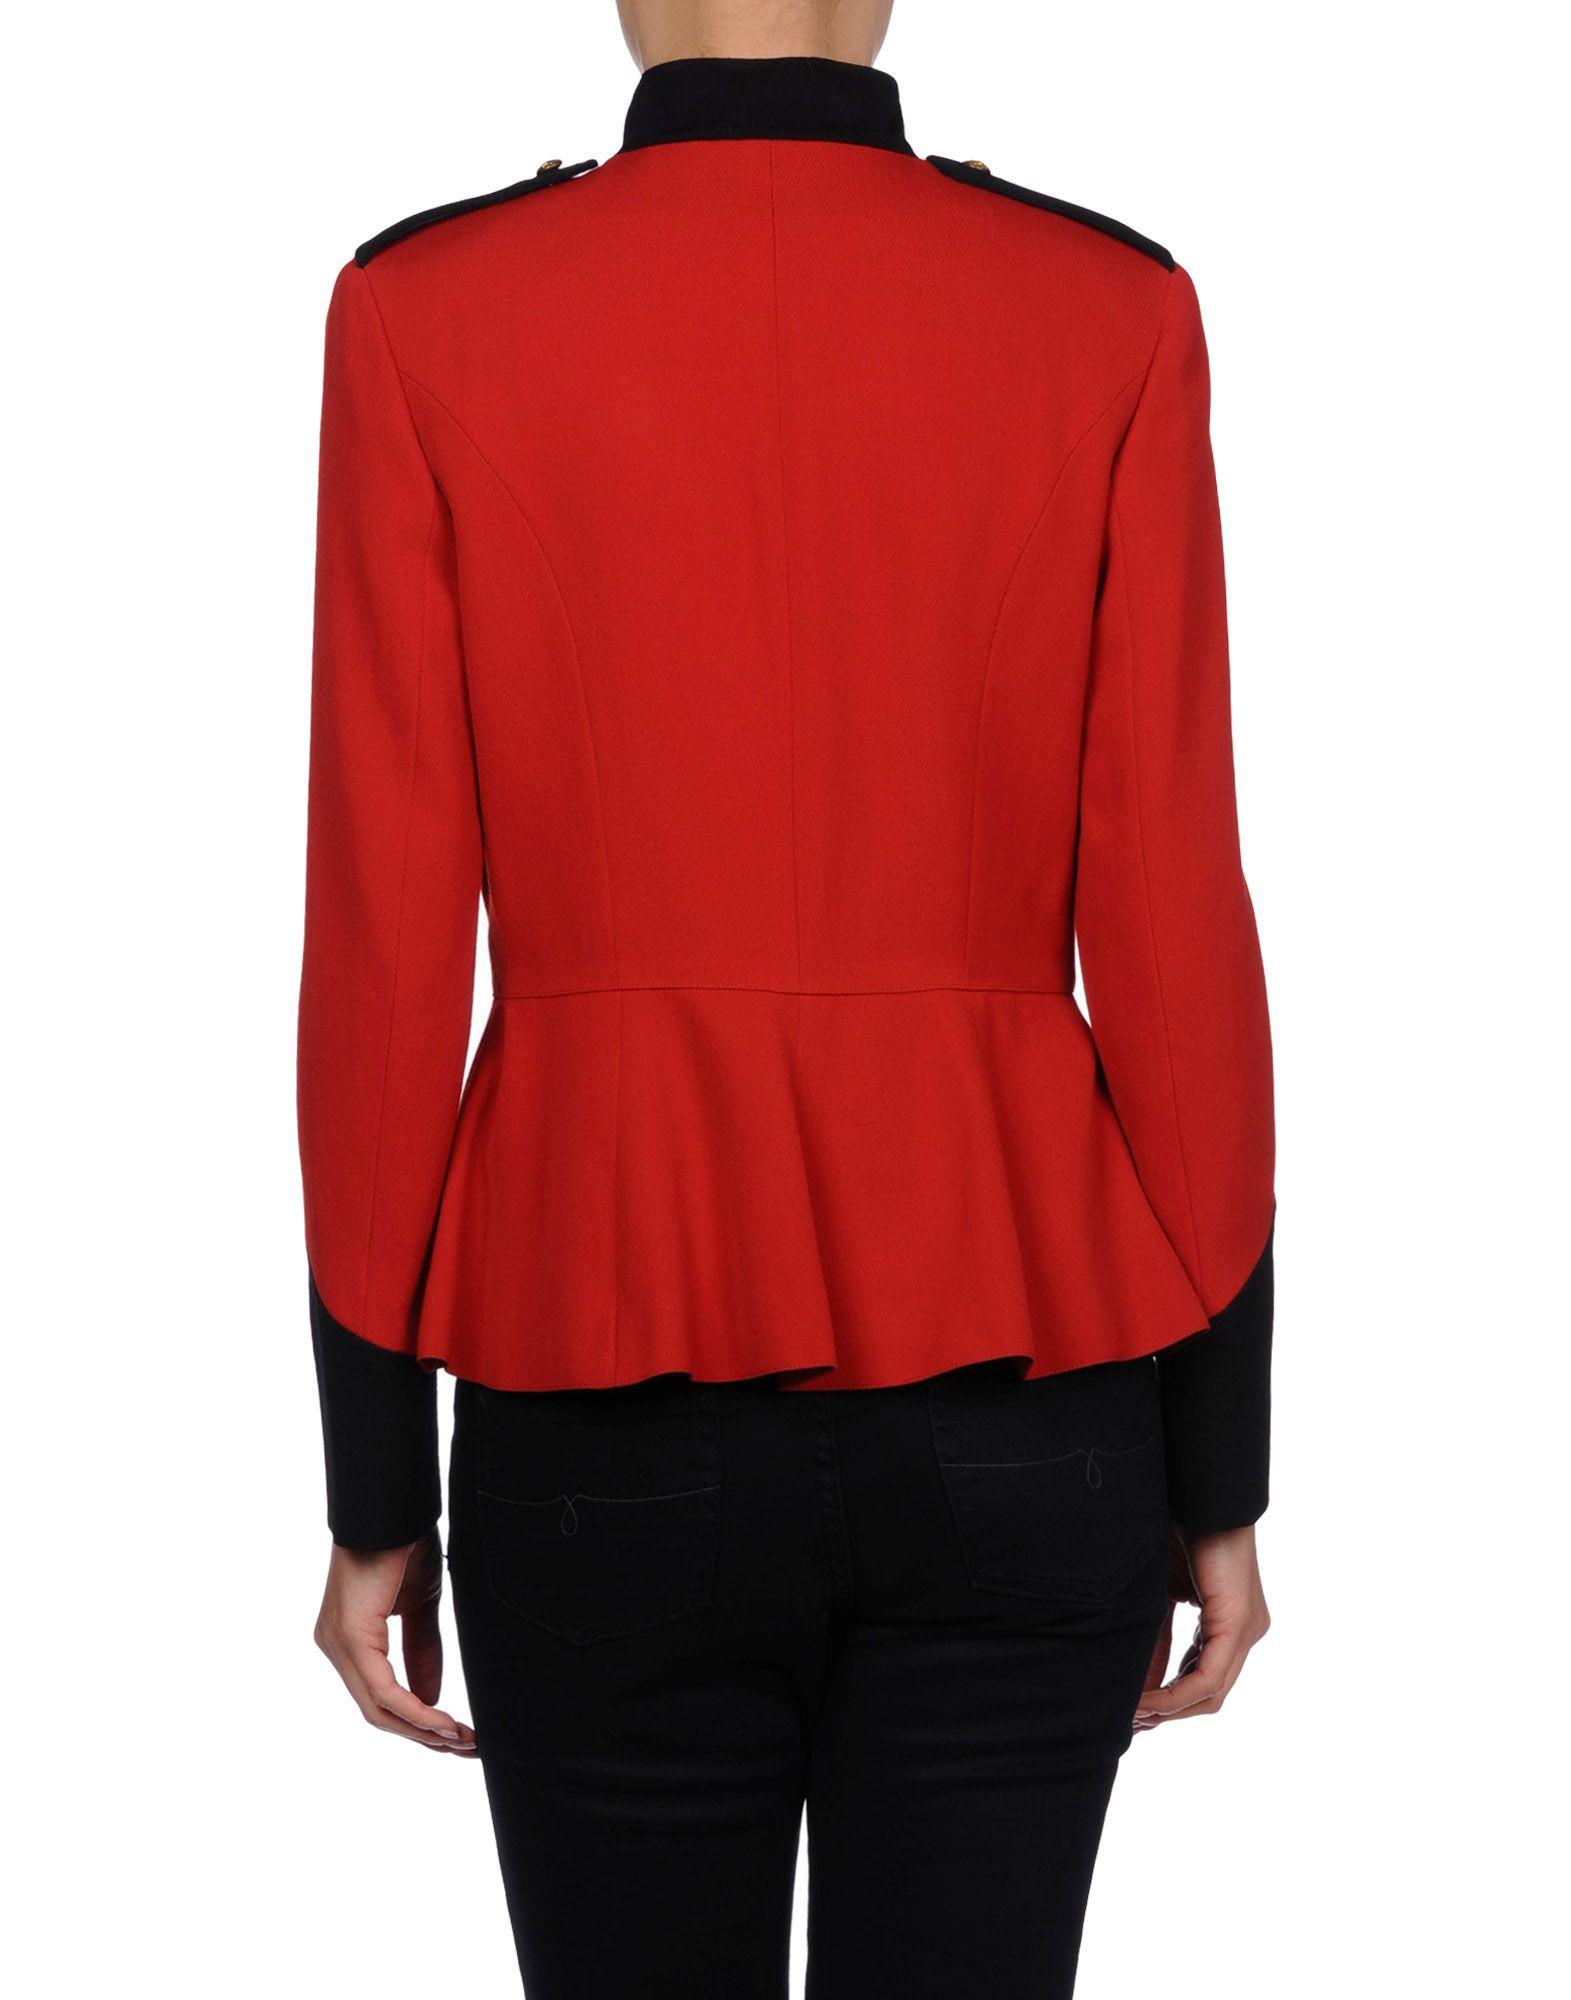 lyst ralph lauren blazer in red. Black Bedroom Furniture Sets. Home Design Ideas